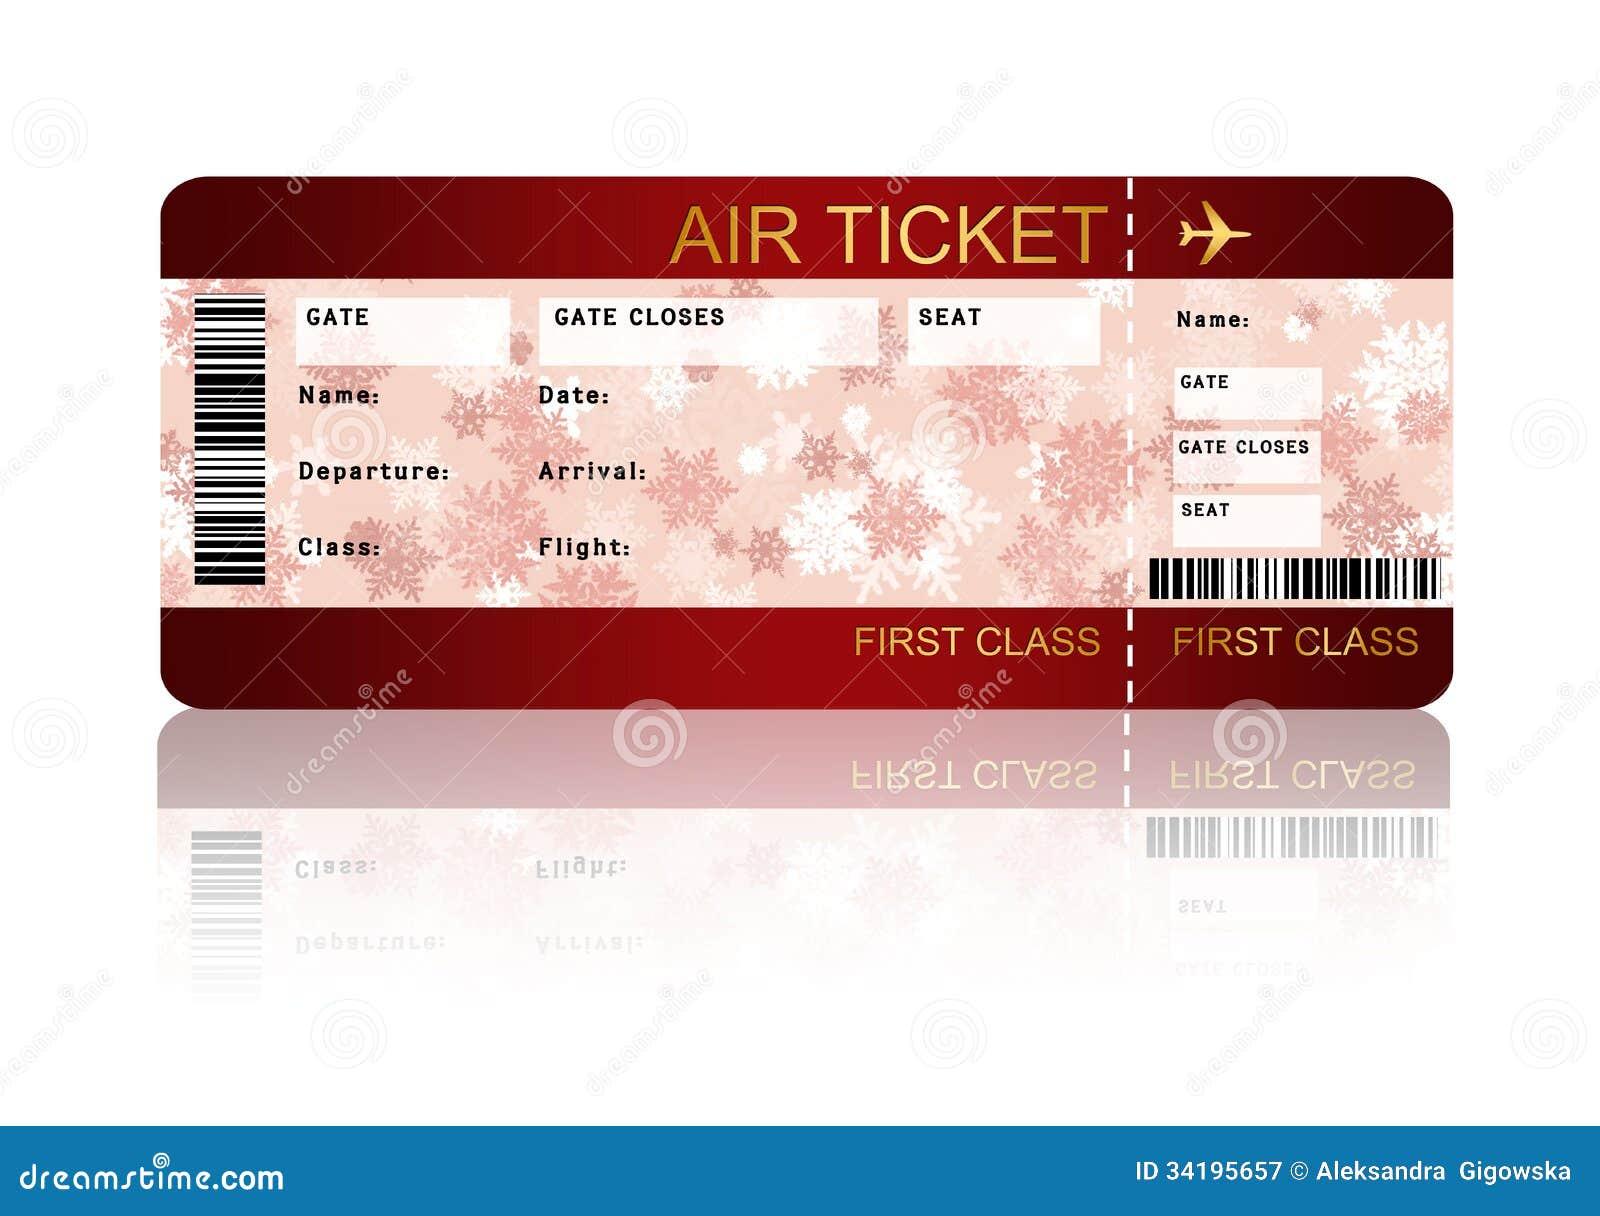 blank boarding pass template | datariouruguay